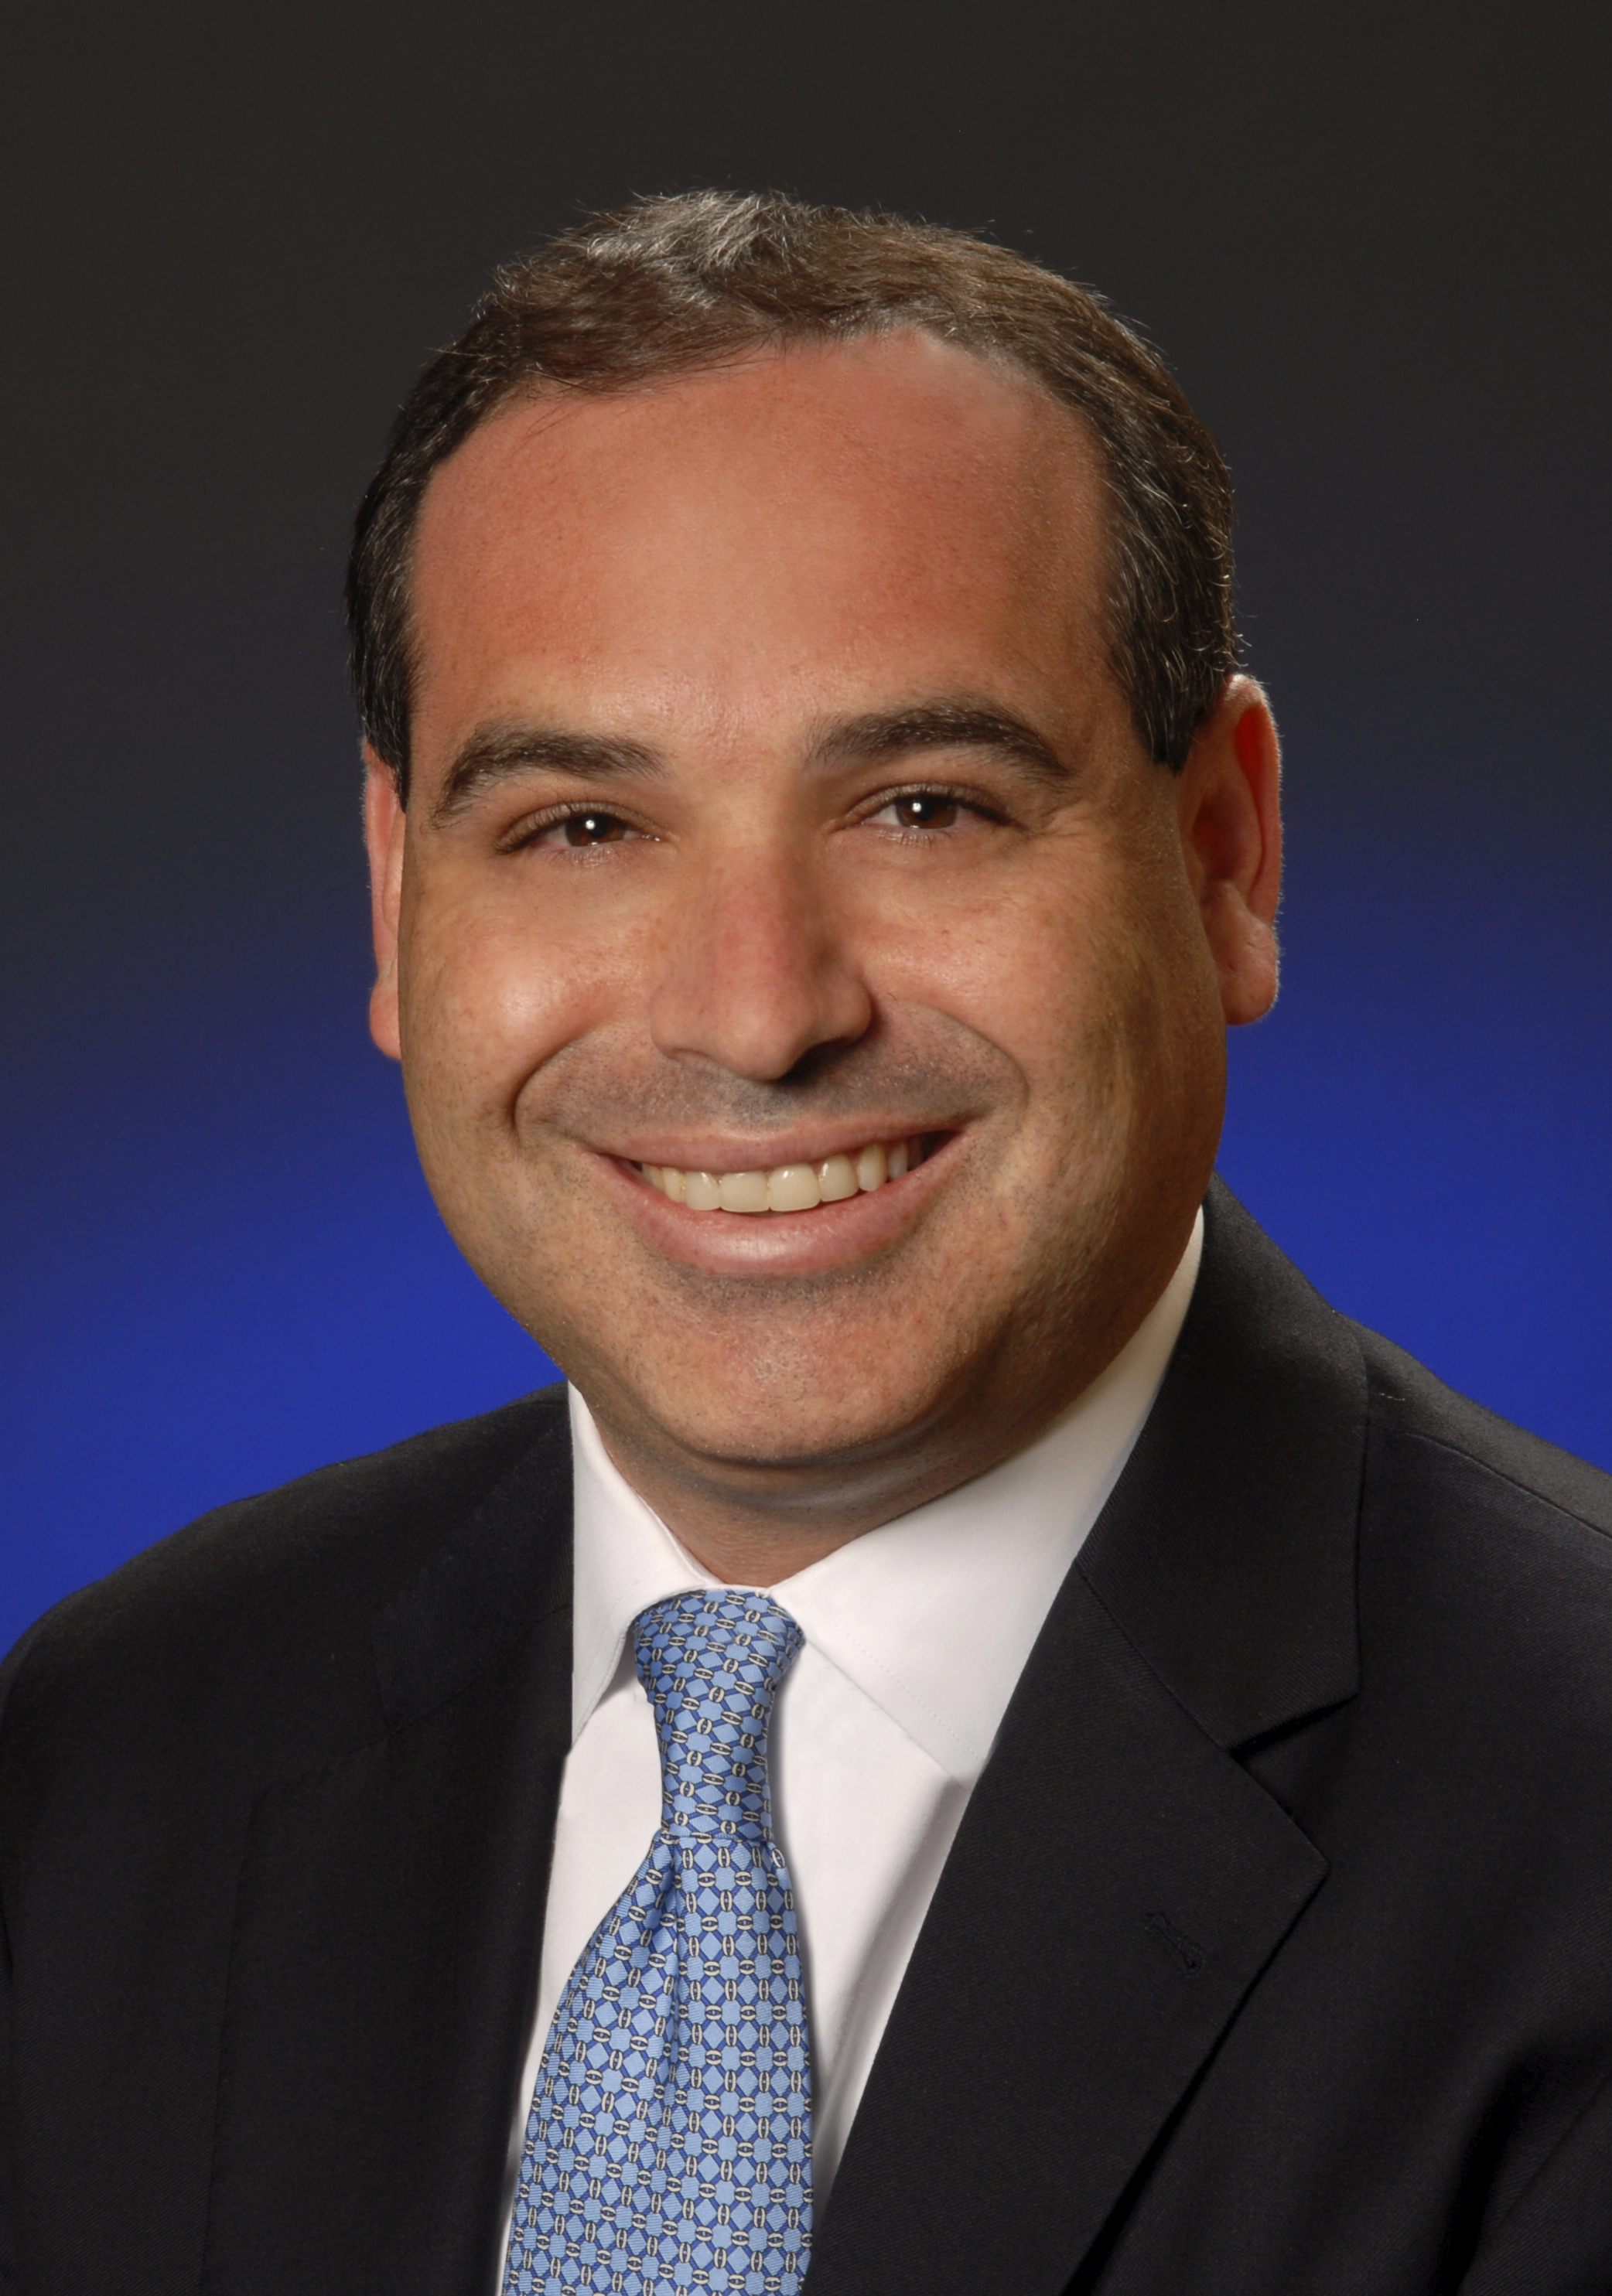 P.J. Pearlstone, financial advisor Baltimore MD